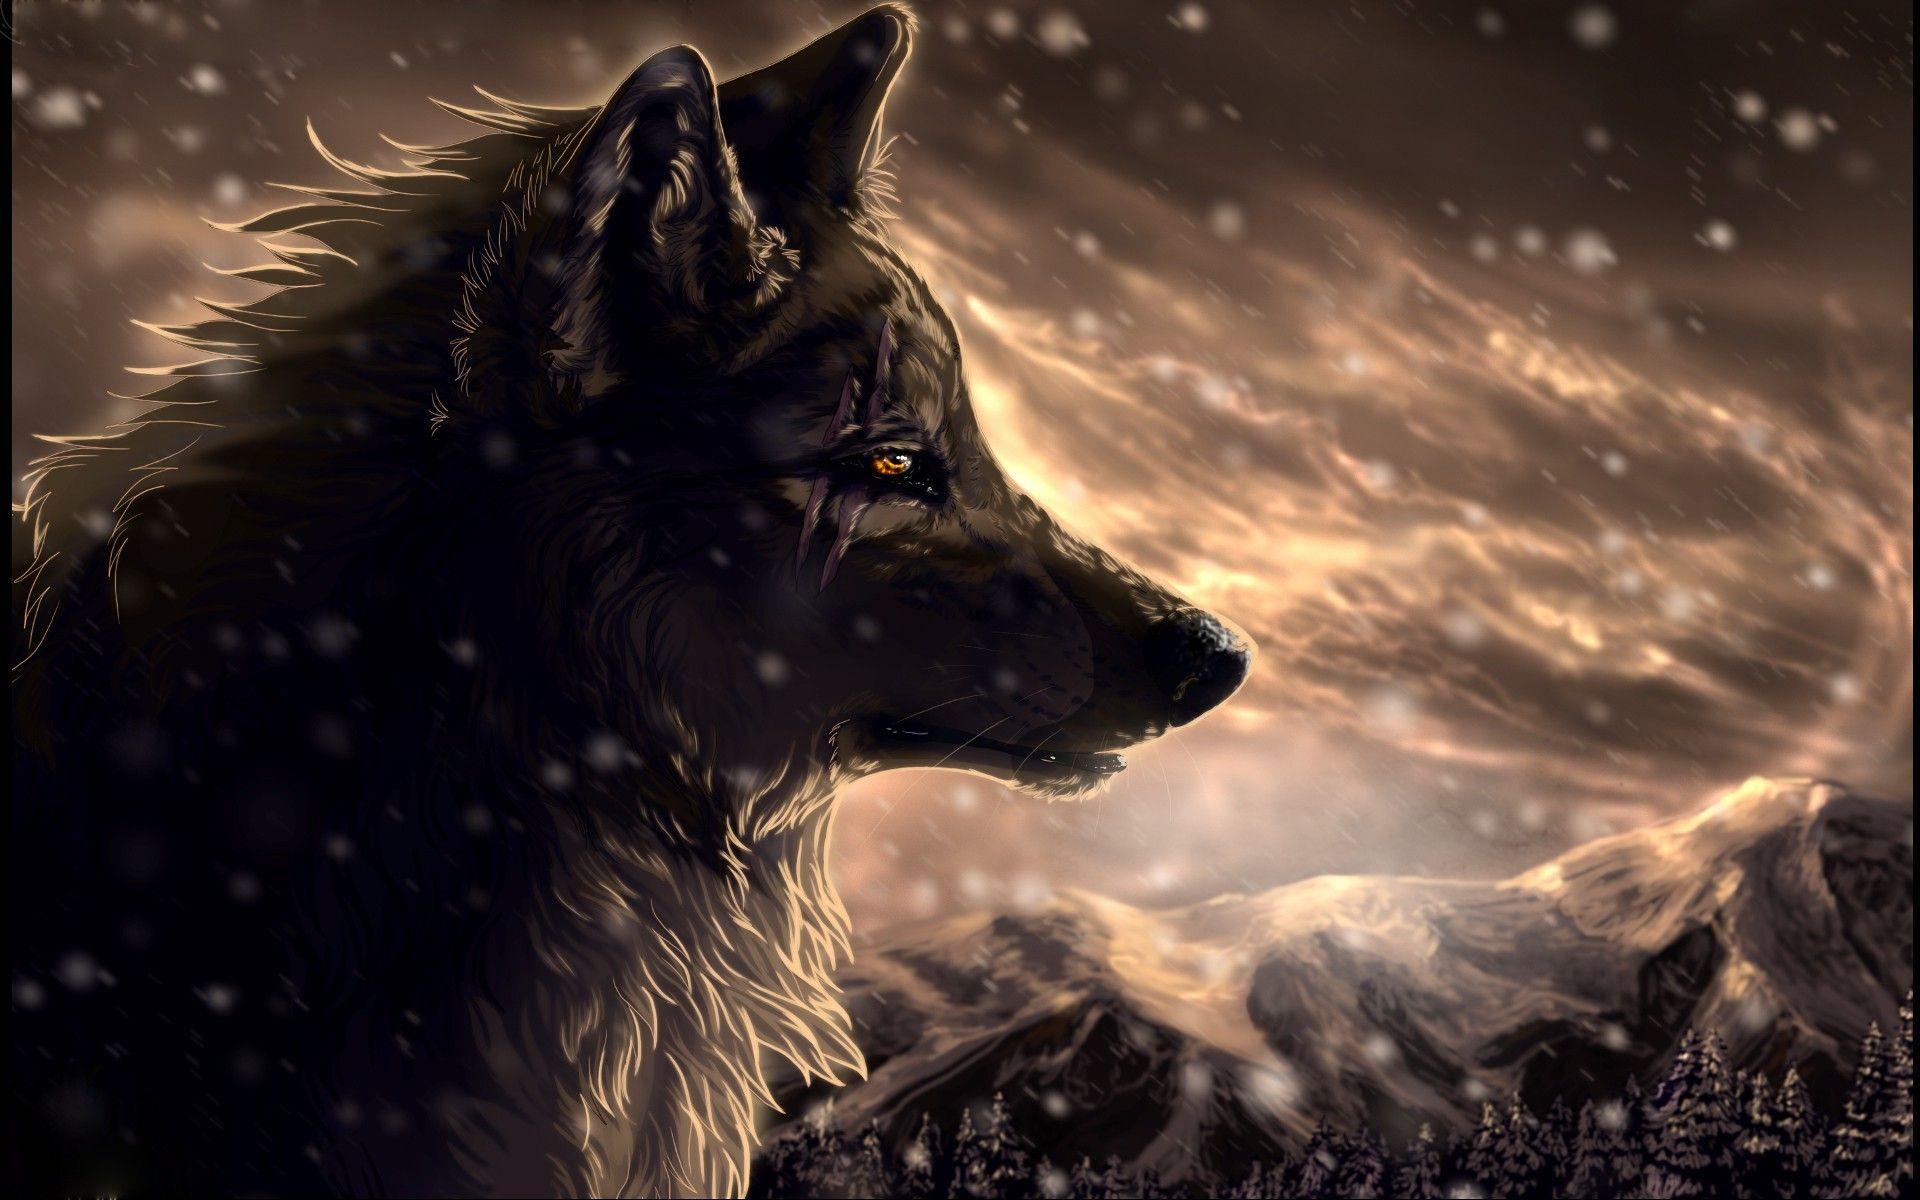 71 Animated Wolf Wallpapers On Wallpaperplay Grafis Multimedia Desain Grafis